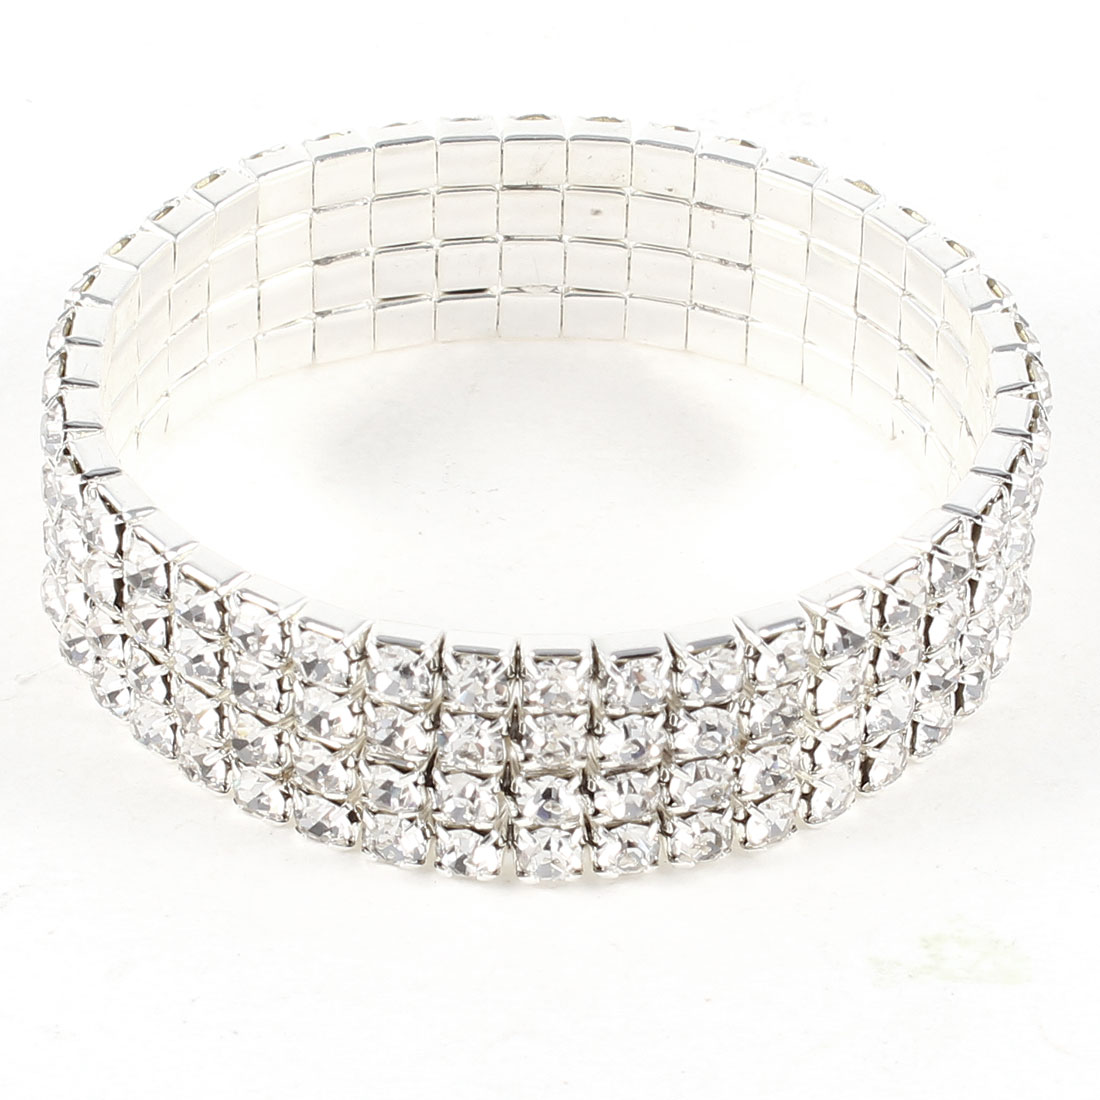 Girls Silver Tone Glittery Rhinestone Decor Metallic Strap Bracelet